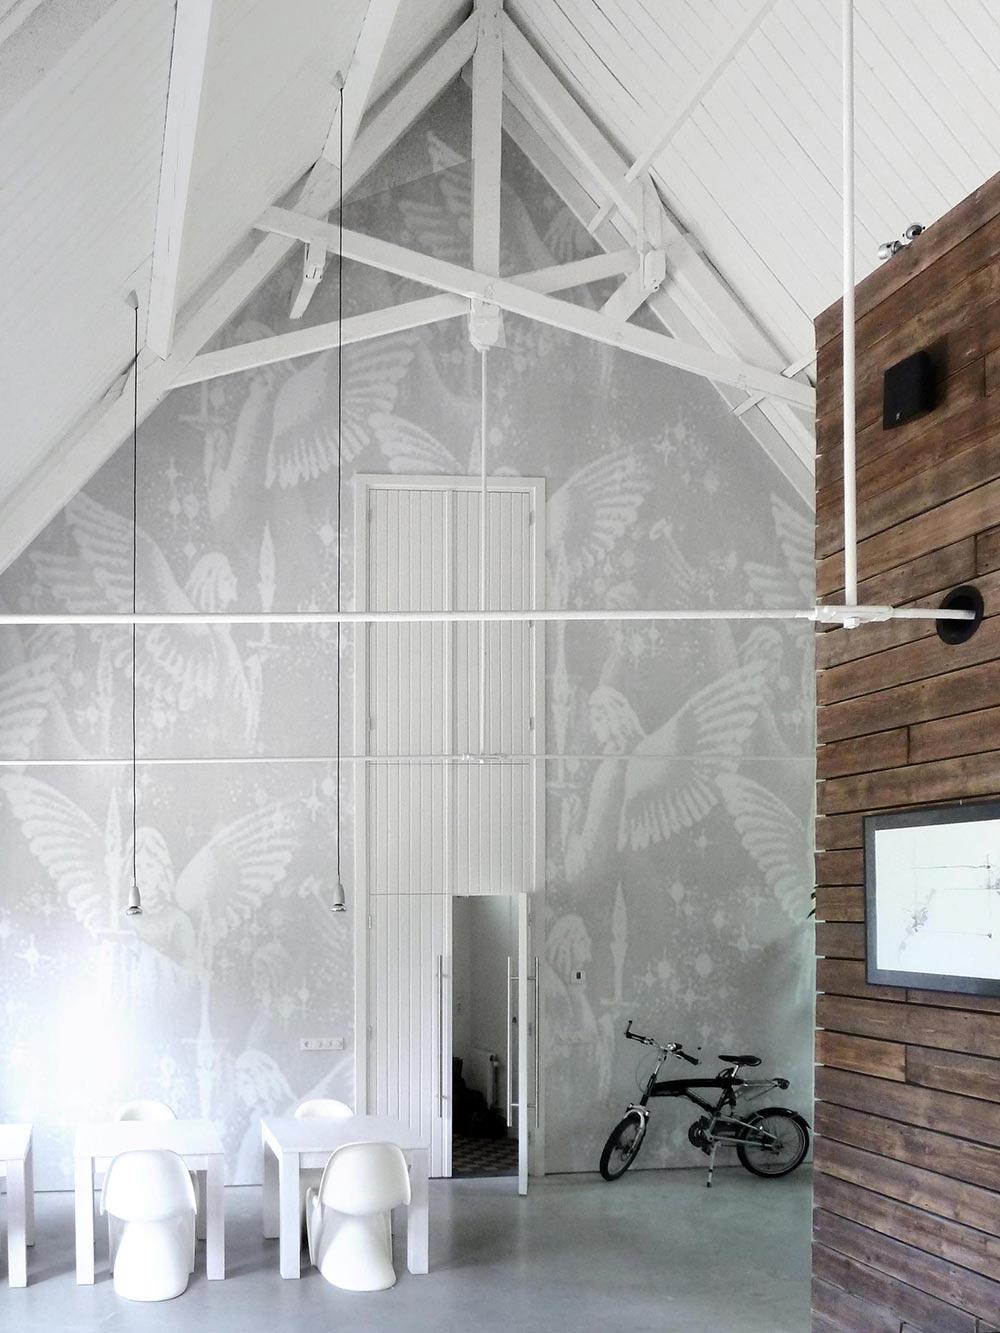 Angel Wallpaper, Unique Loft Conversion in The Netherlands